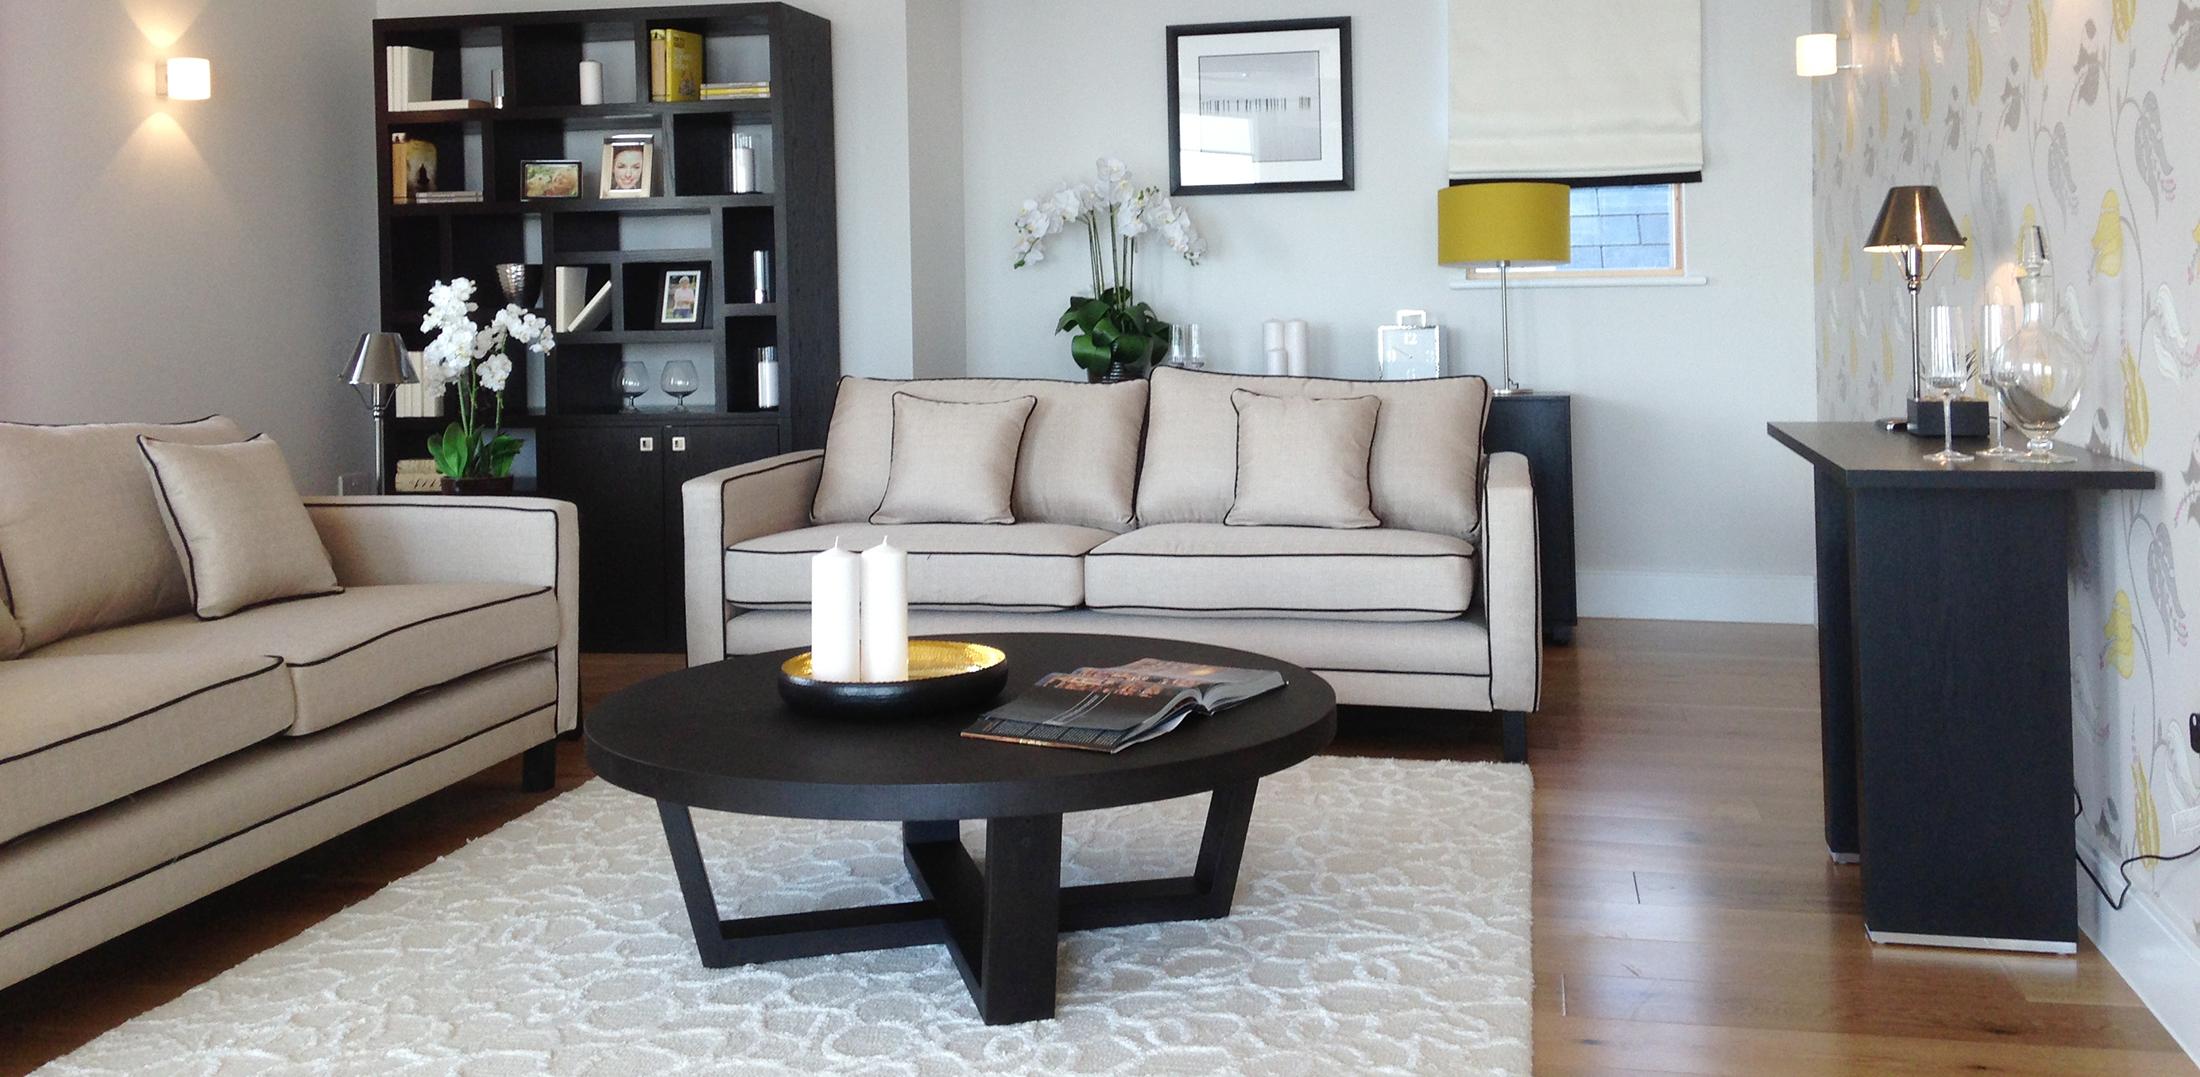 interior_design_torbay_1